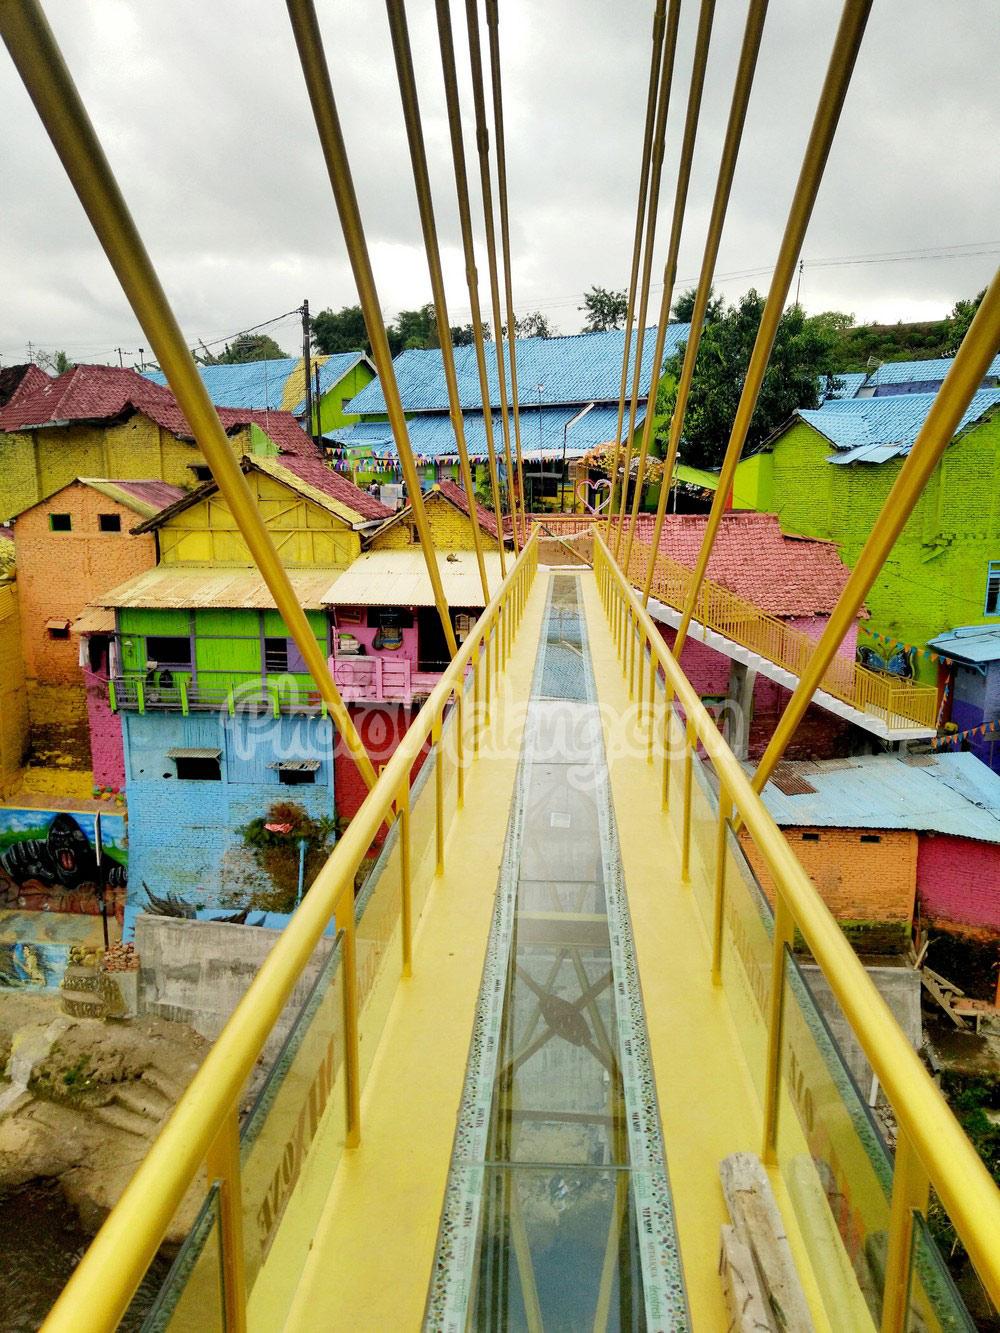 Foto Jembatan Kaca Kampung Warna Warni Jodipan Malang Kab